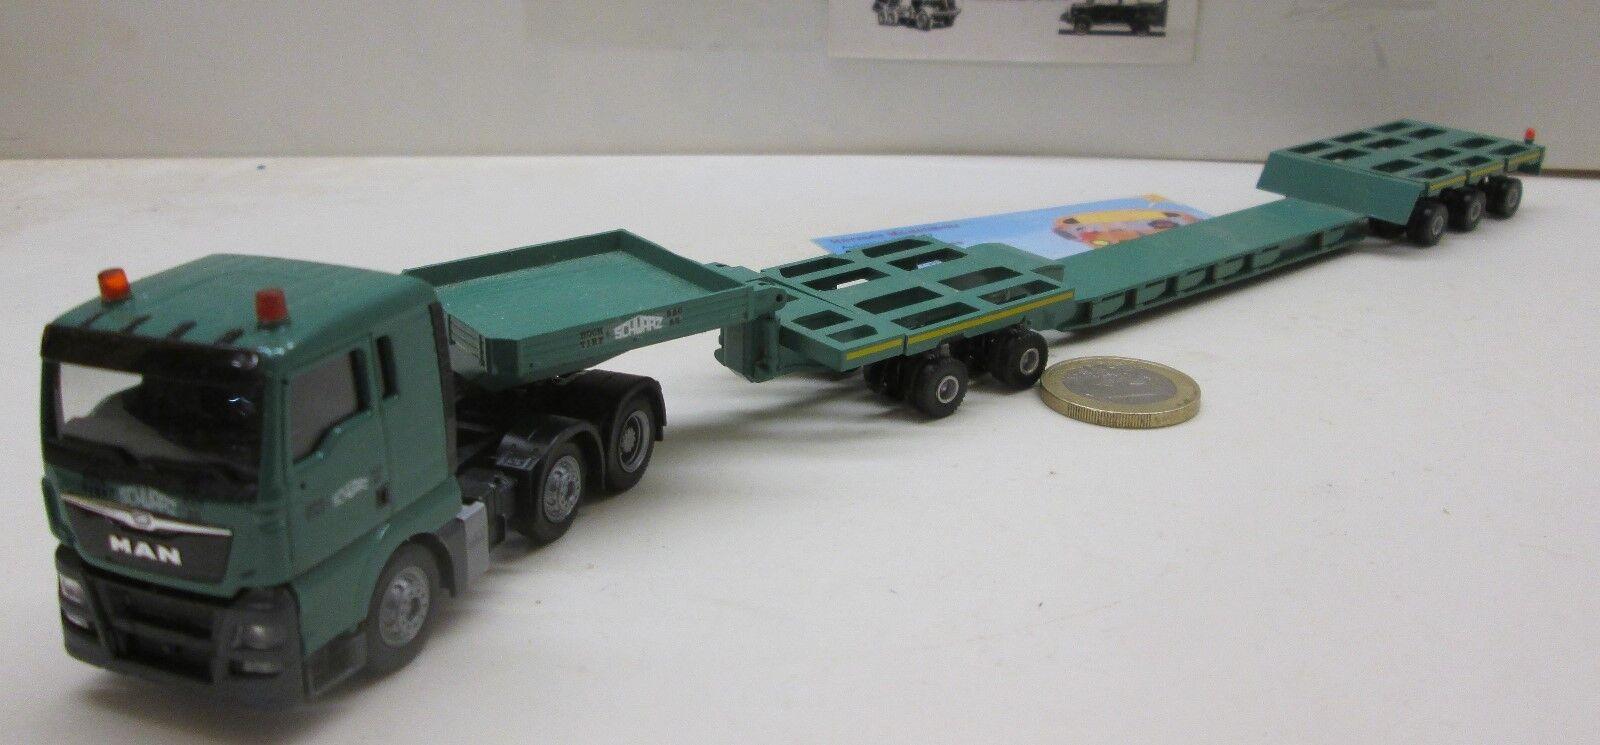 SW0608   MAN TGX XL, Tiefladesattelzug mit mit mit Baggerbett   Schwarz Bau    (48) db5c57